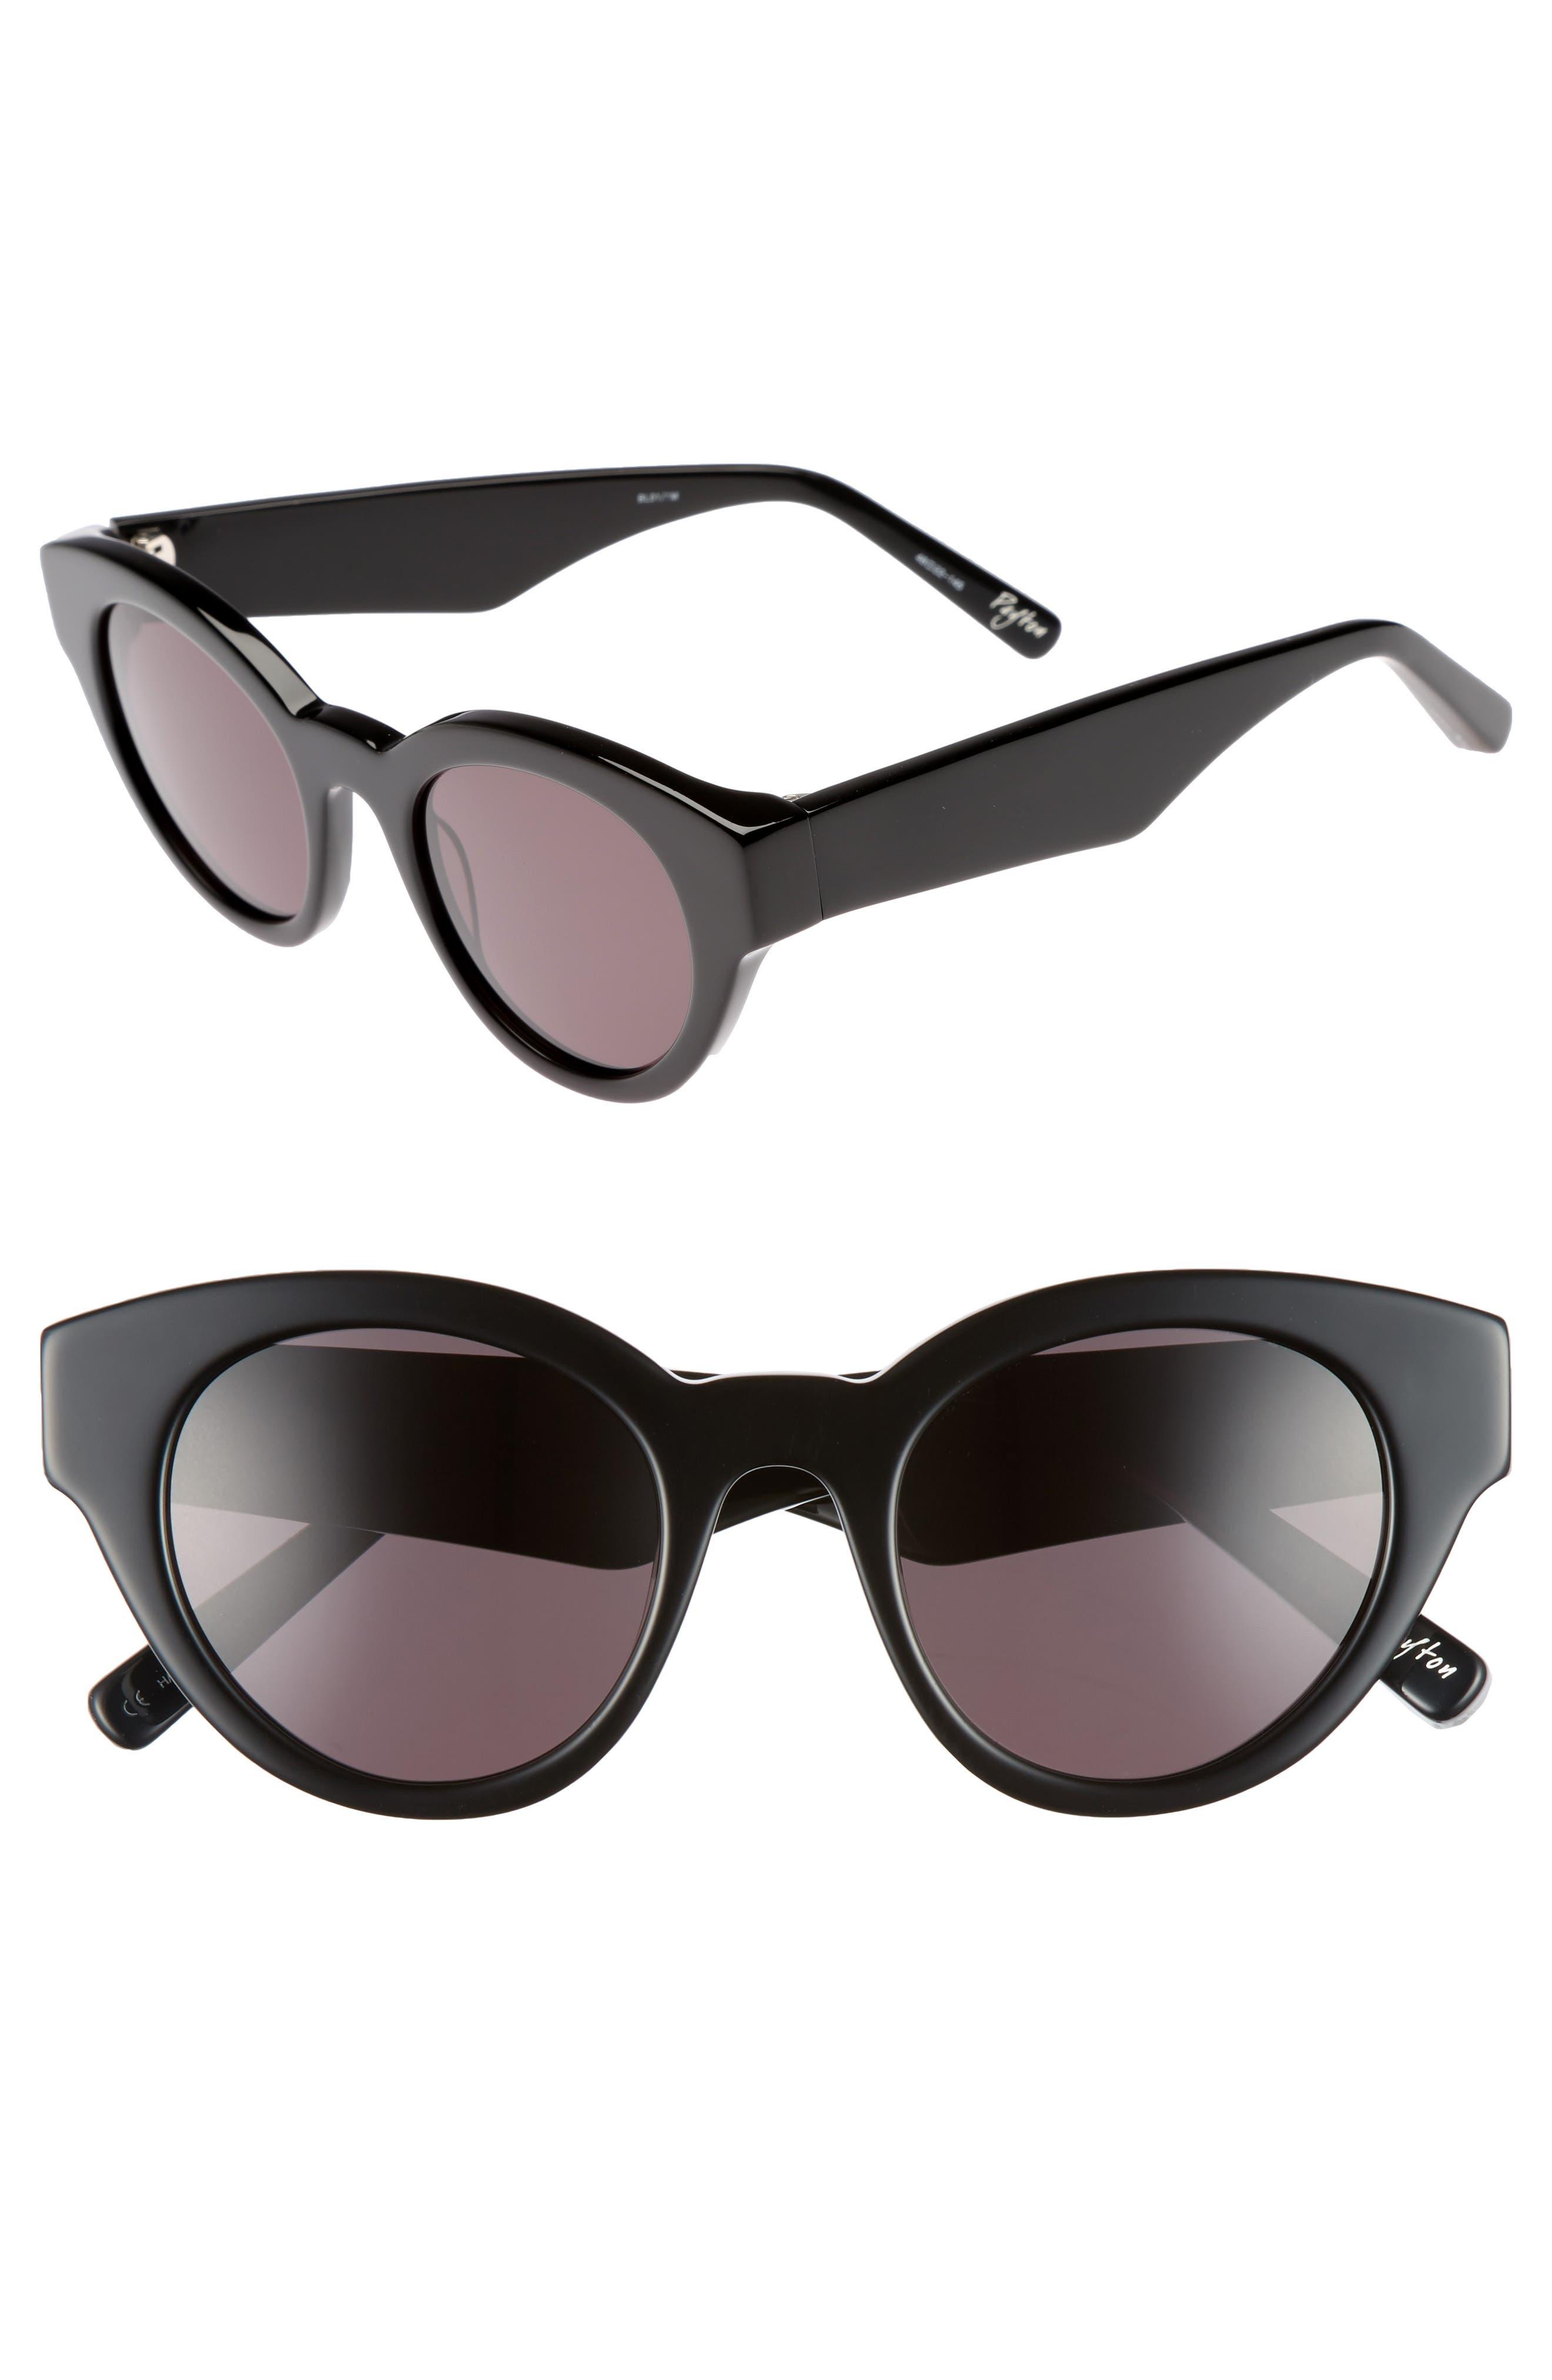 Payton 48mm Cat Eye Sunglasses,                             Main thumbnail 1, color,                             001